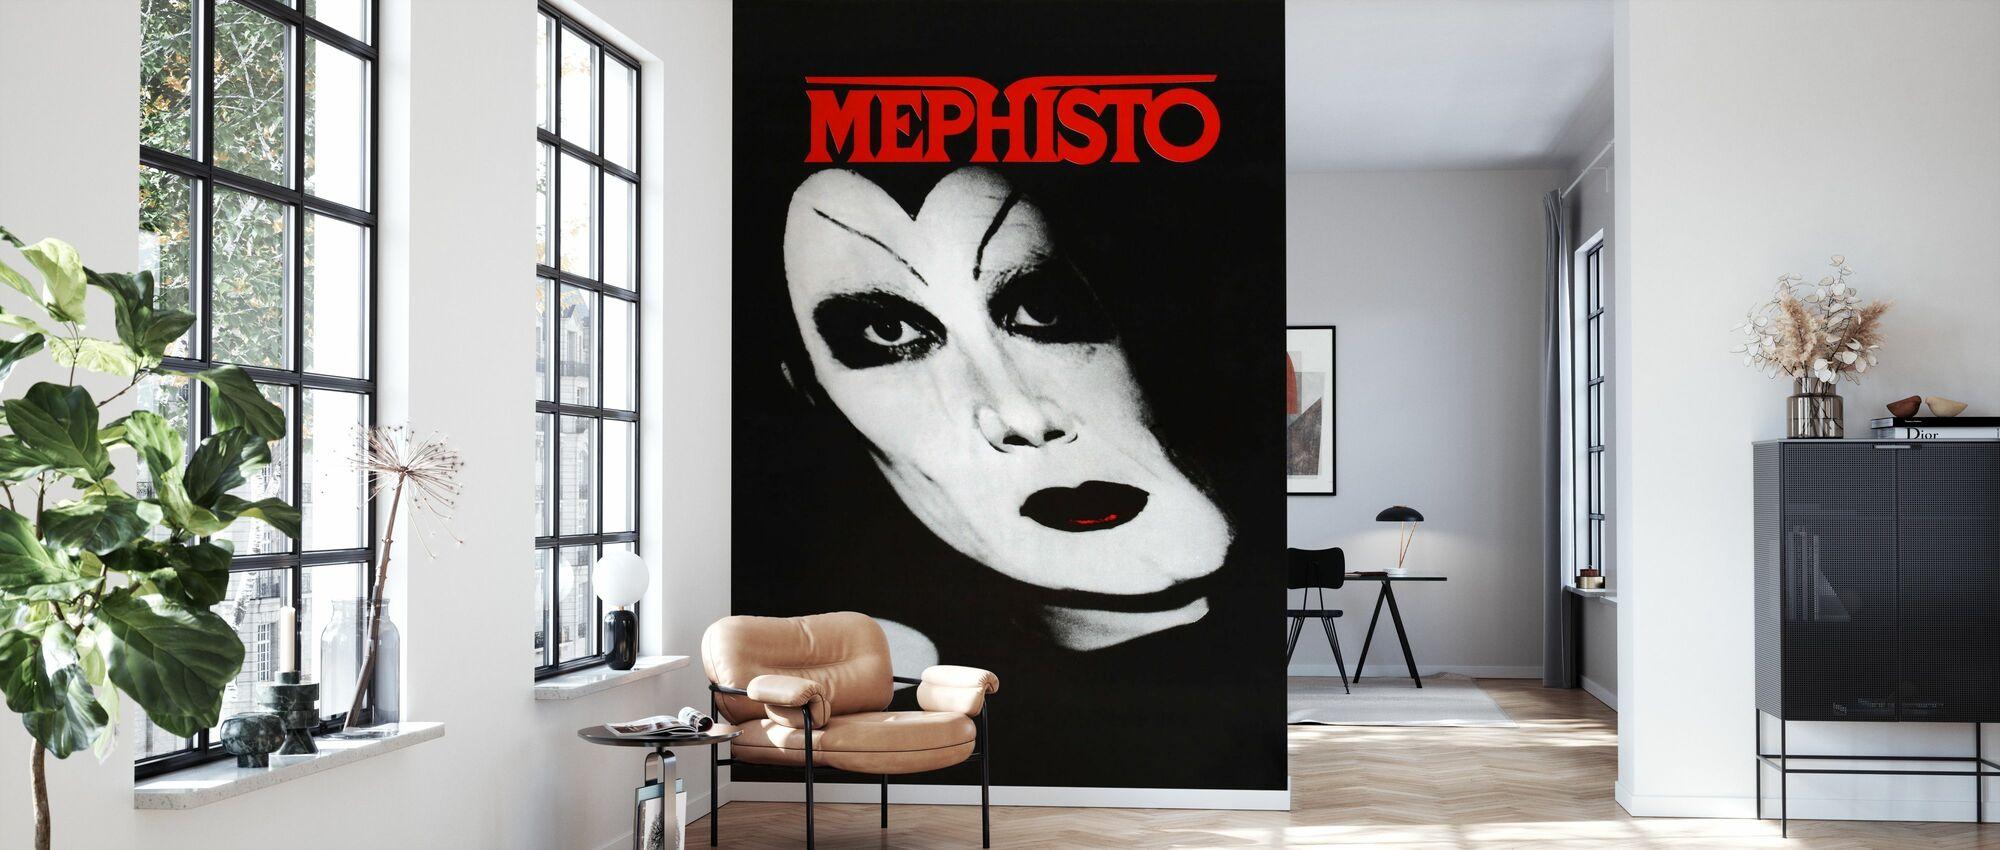 Mephisto - Istvan Szabo - Wallpaper - Living Room